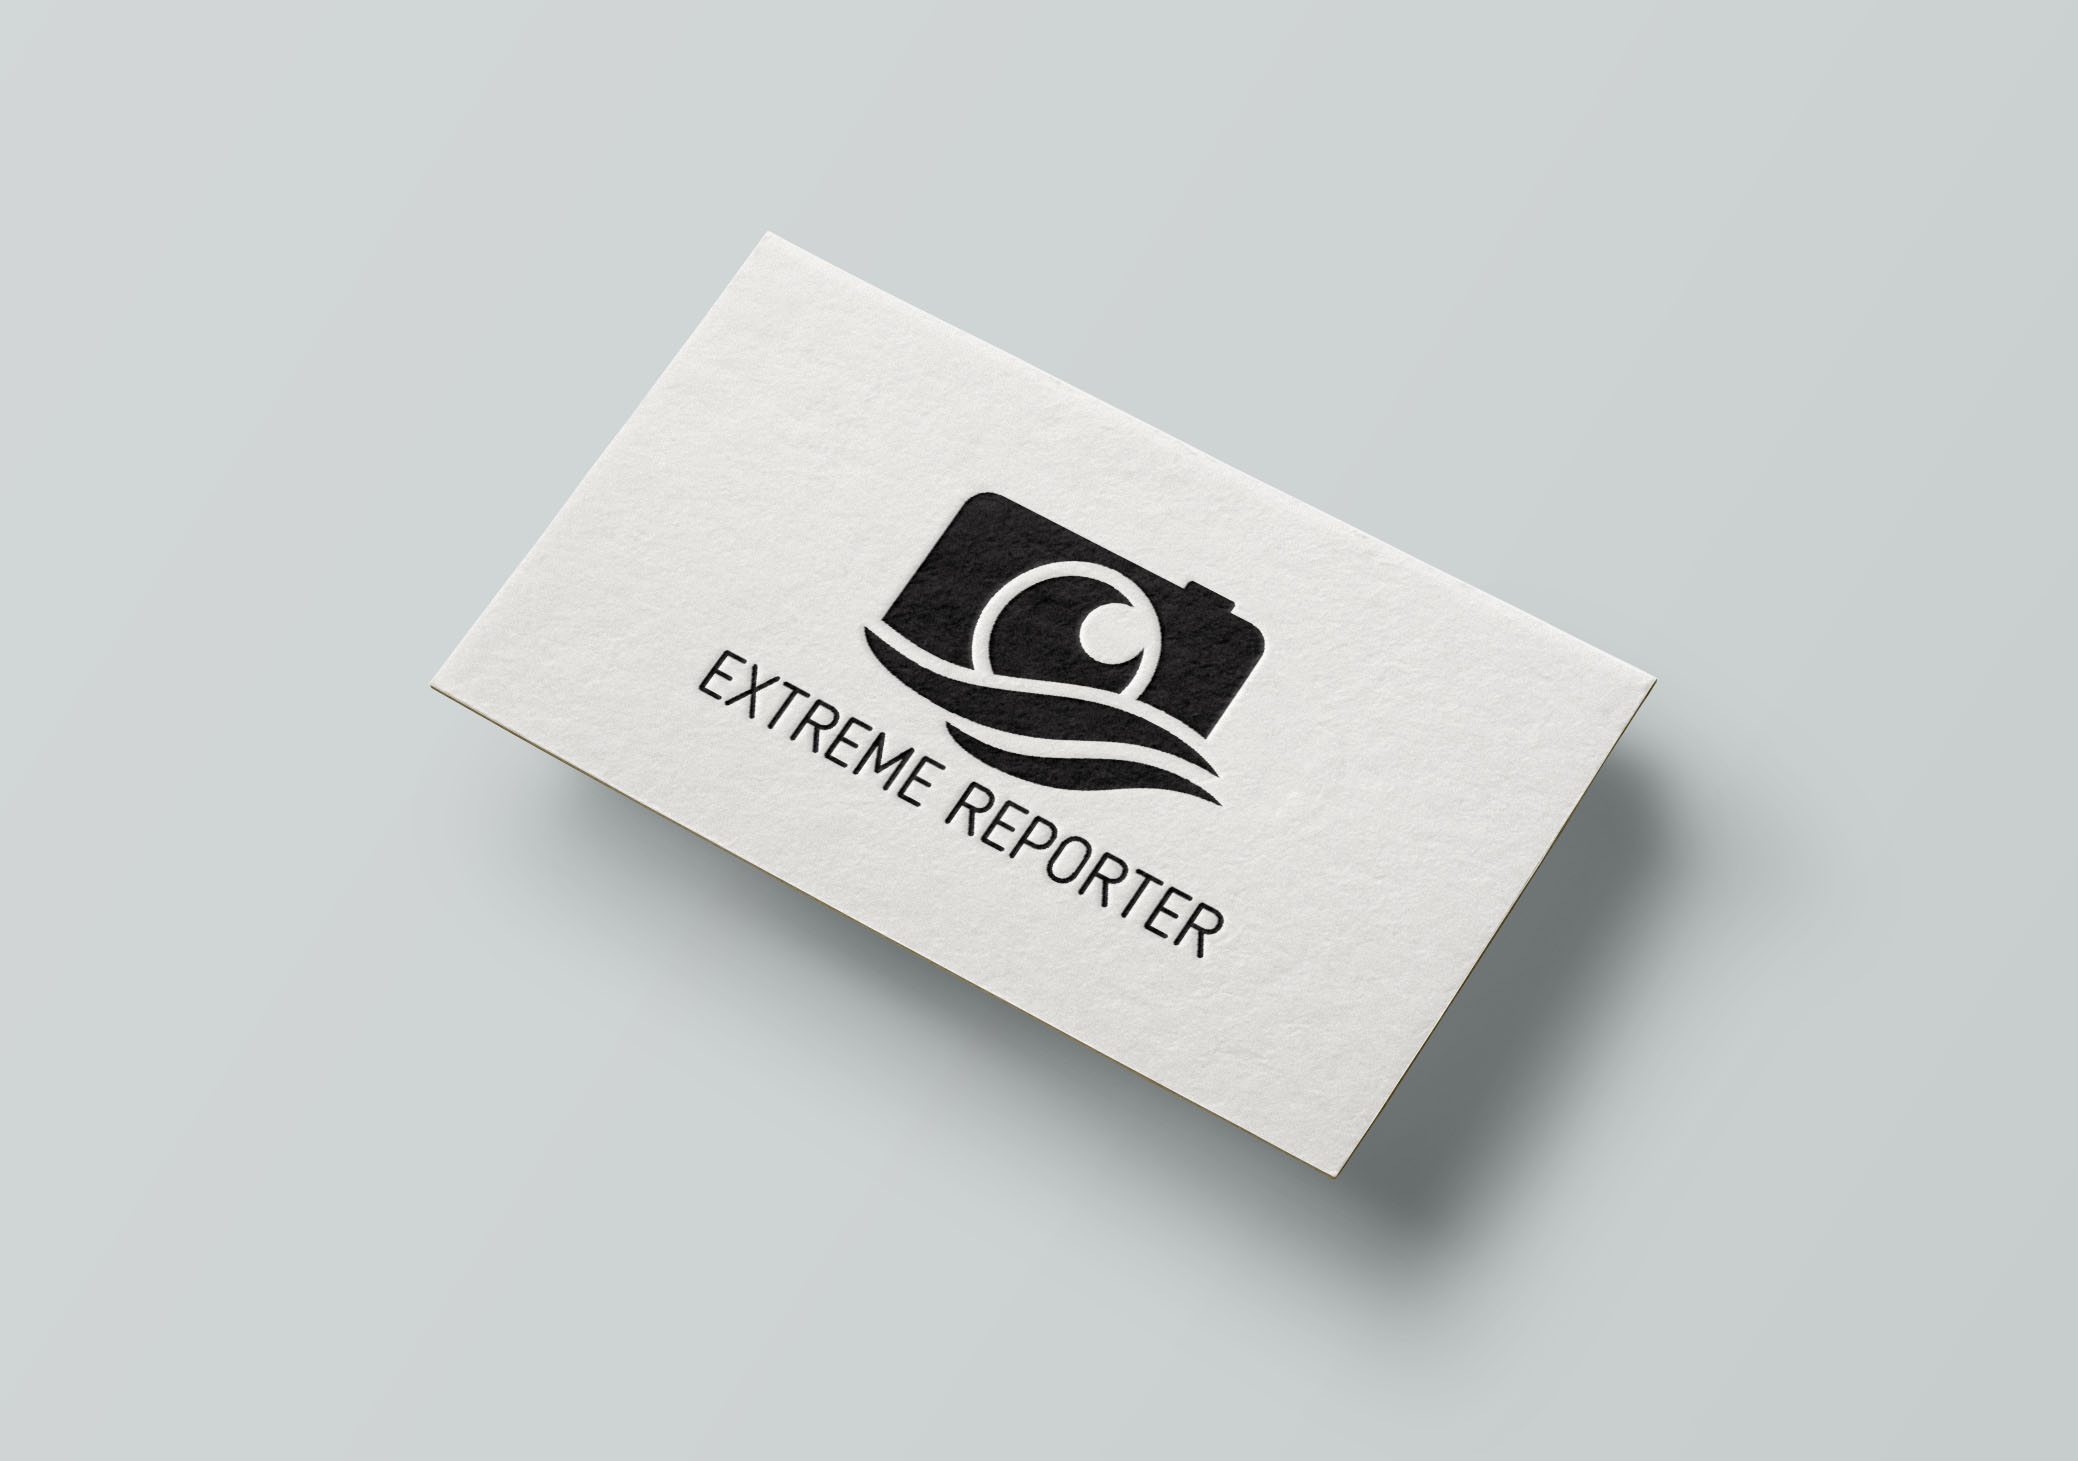 Логотип для экстрим фотографа.  фото f_6155a5372c04efdd.jpg